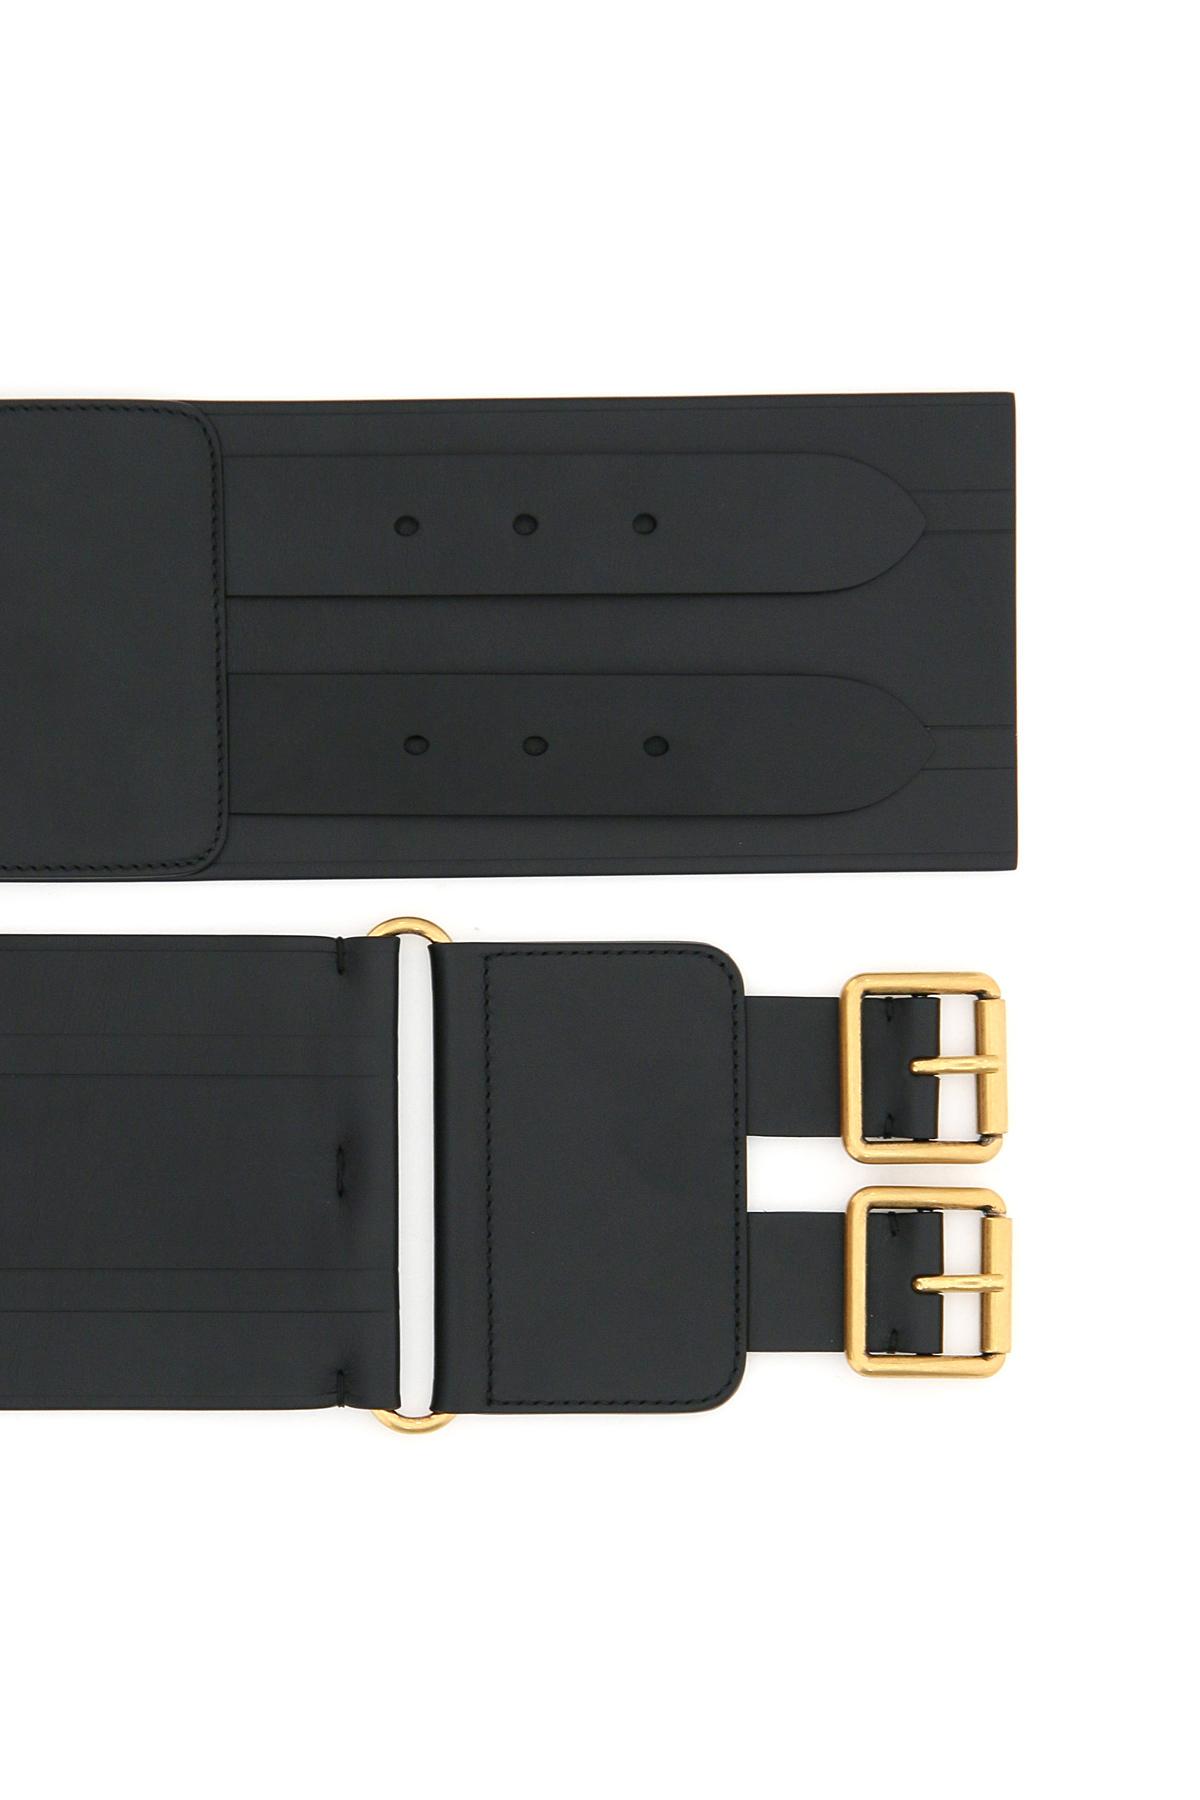 Dior cintura d-waist in pelle